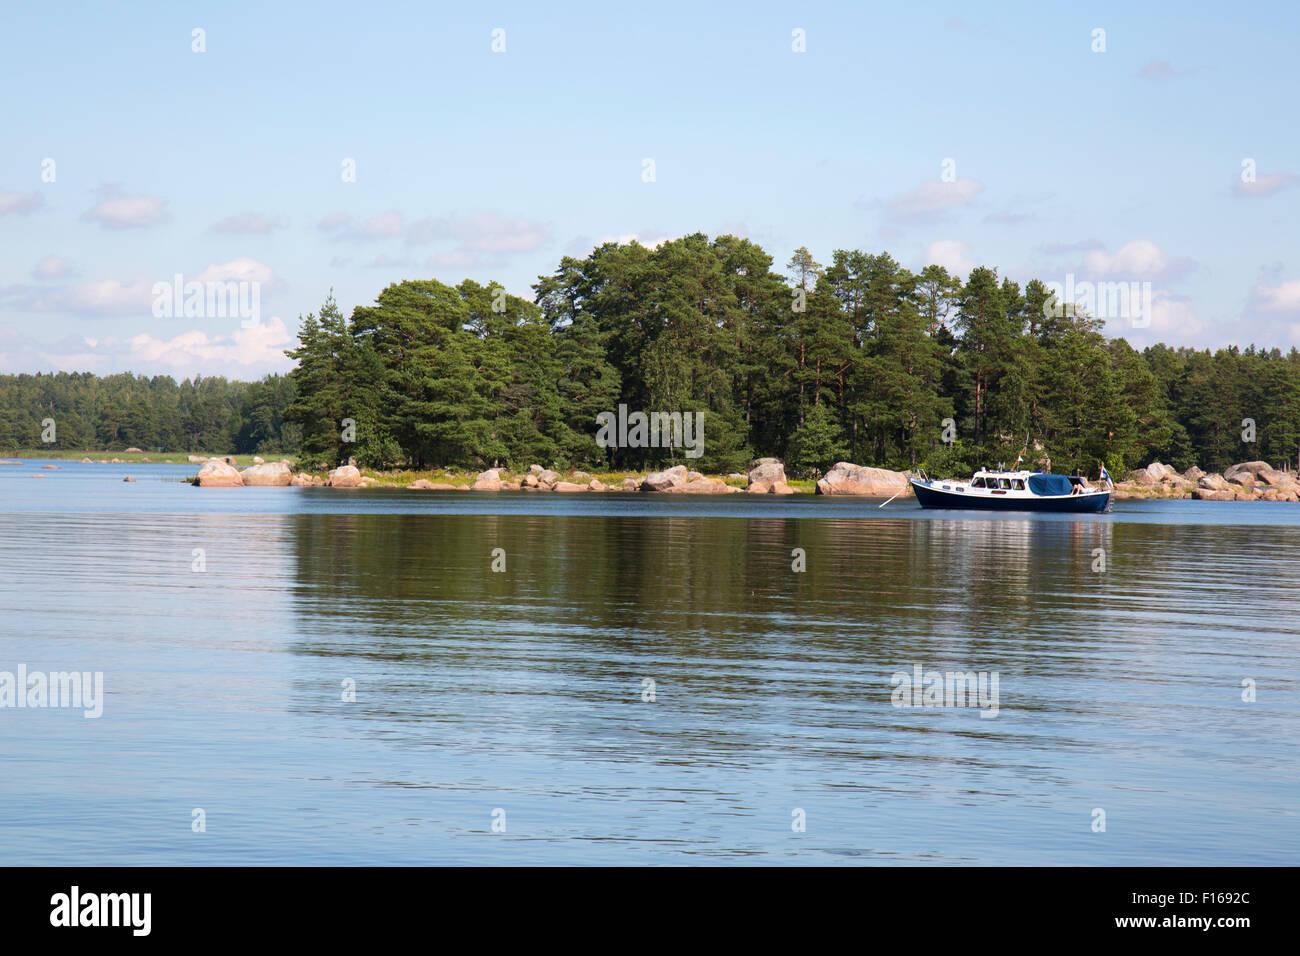 Pleasure boating in Finland. - Stock Image